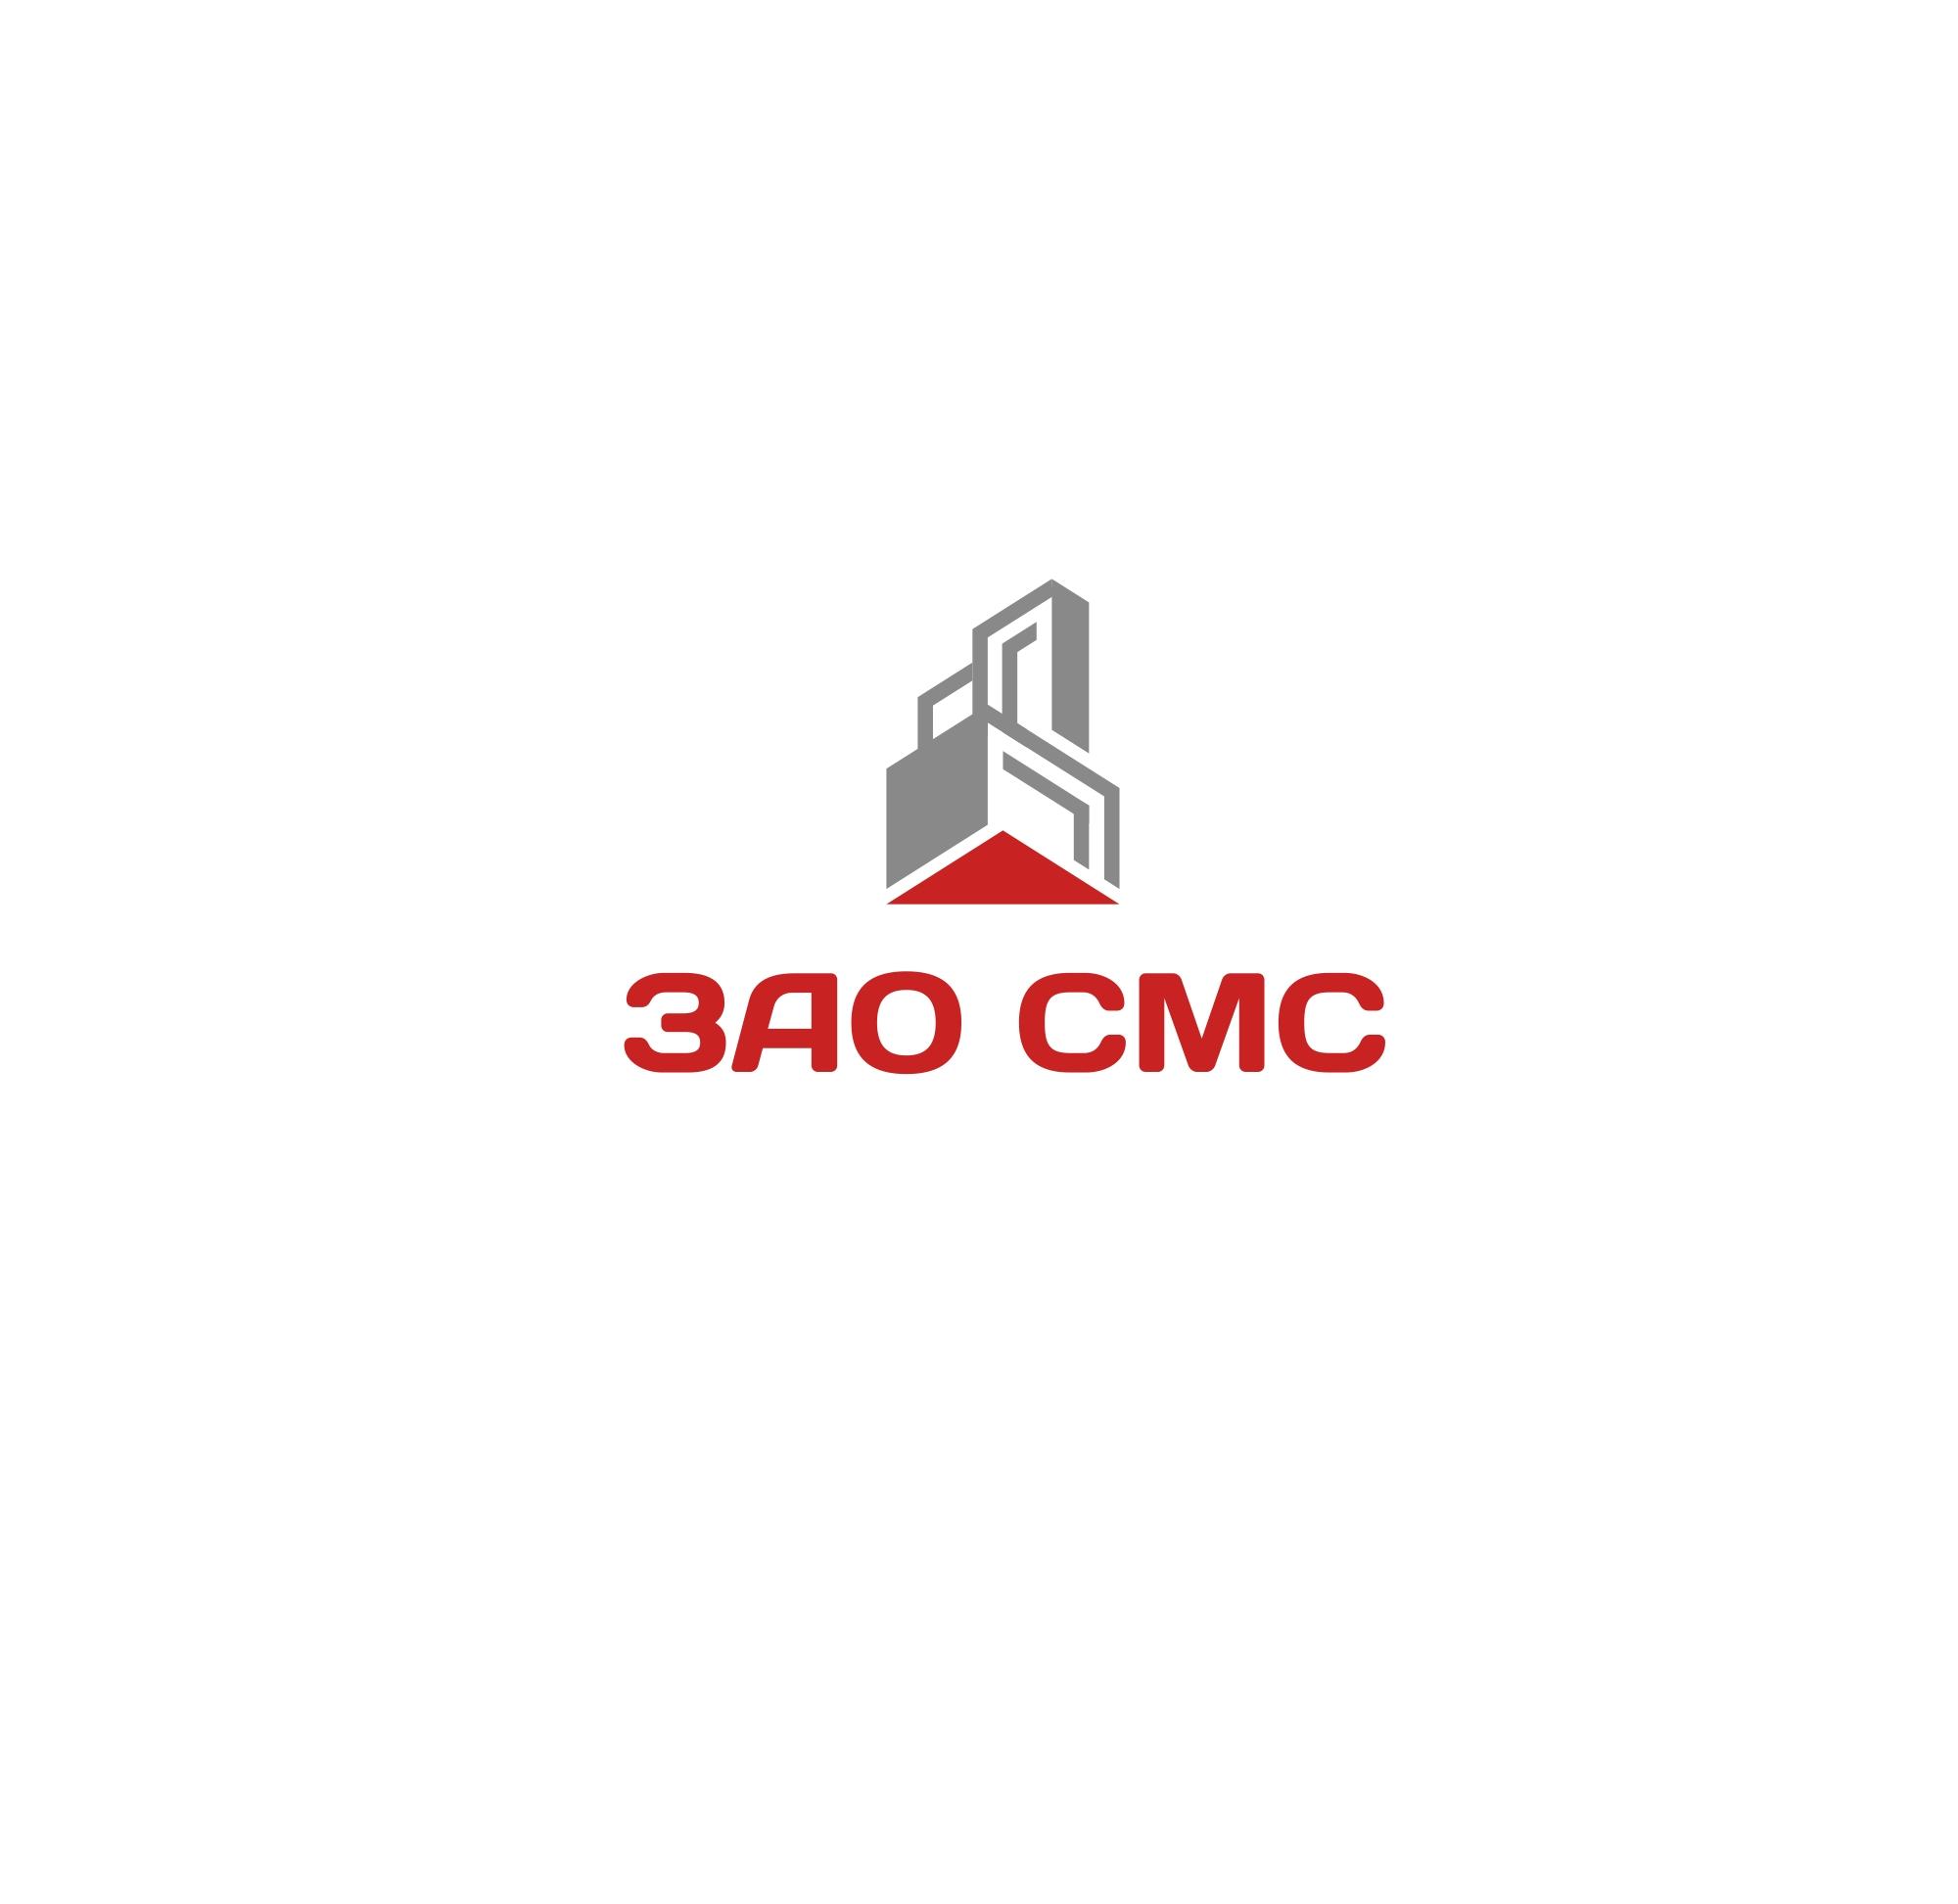 Дизайнер для разработки Логотипа для организации !СРОЧНО! фото f_1935a26dbe9c2a0b.jpg